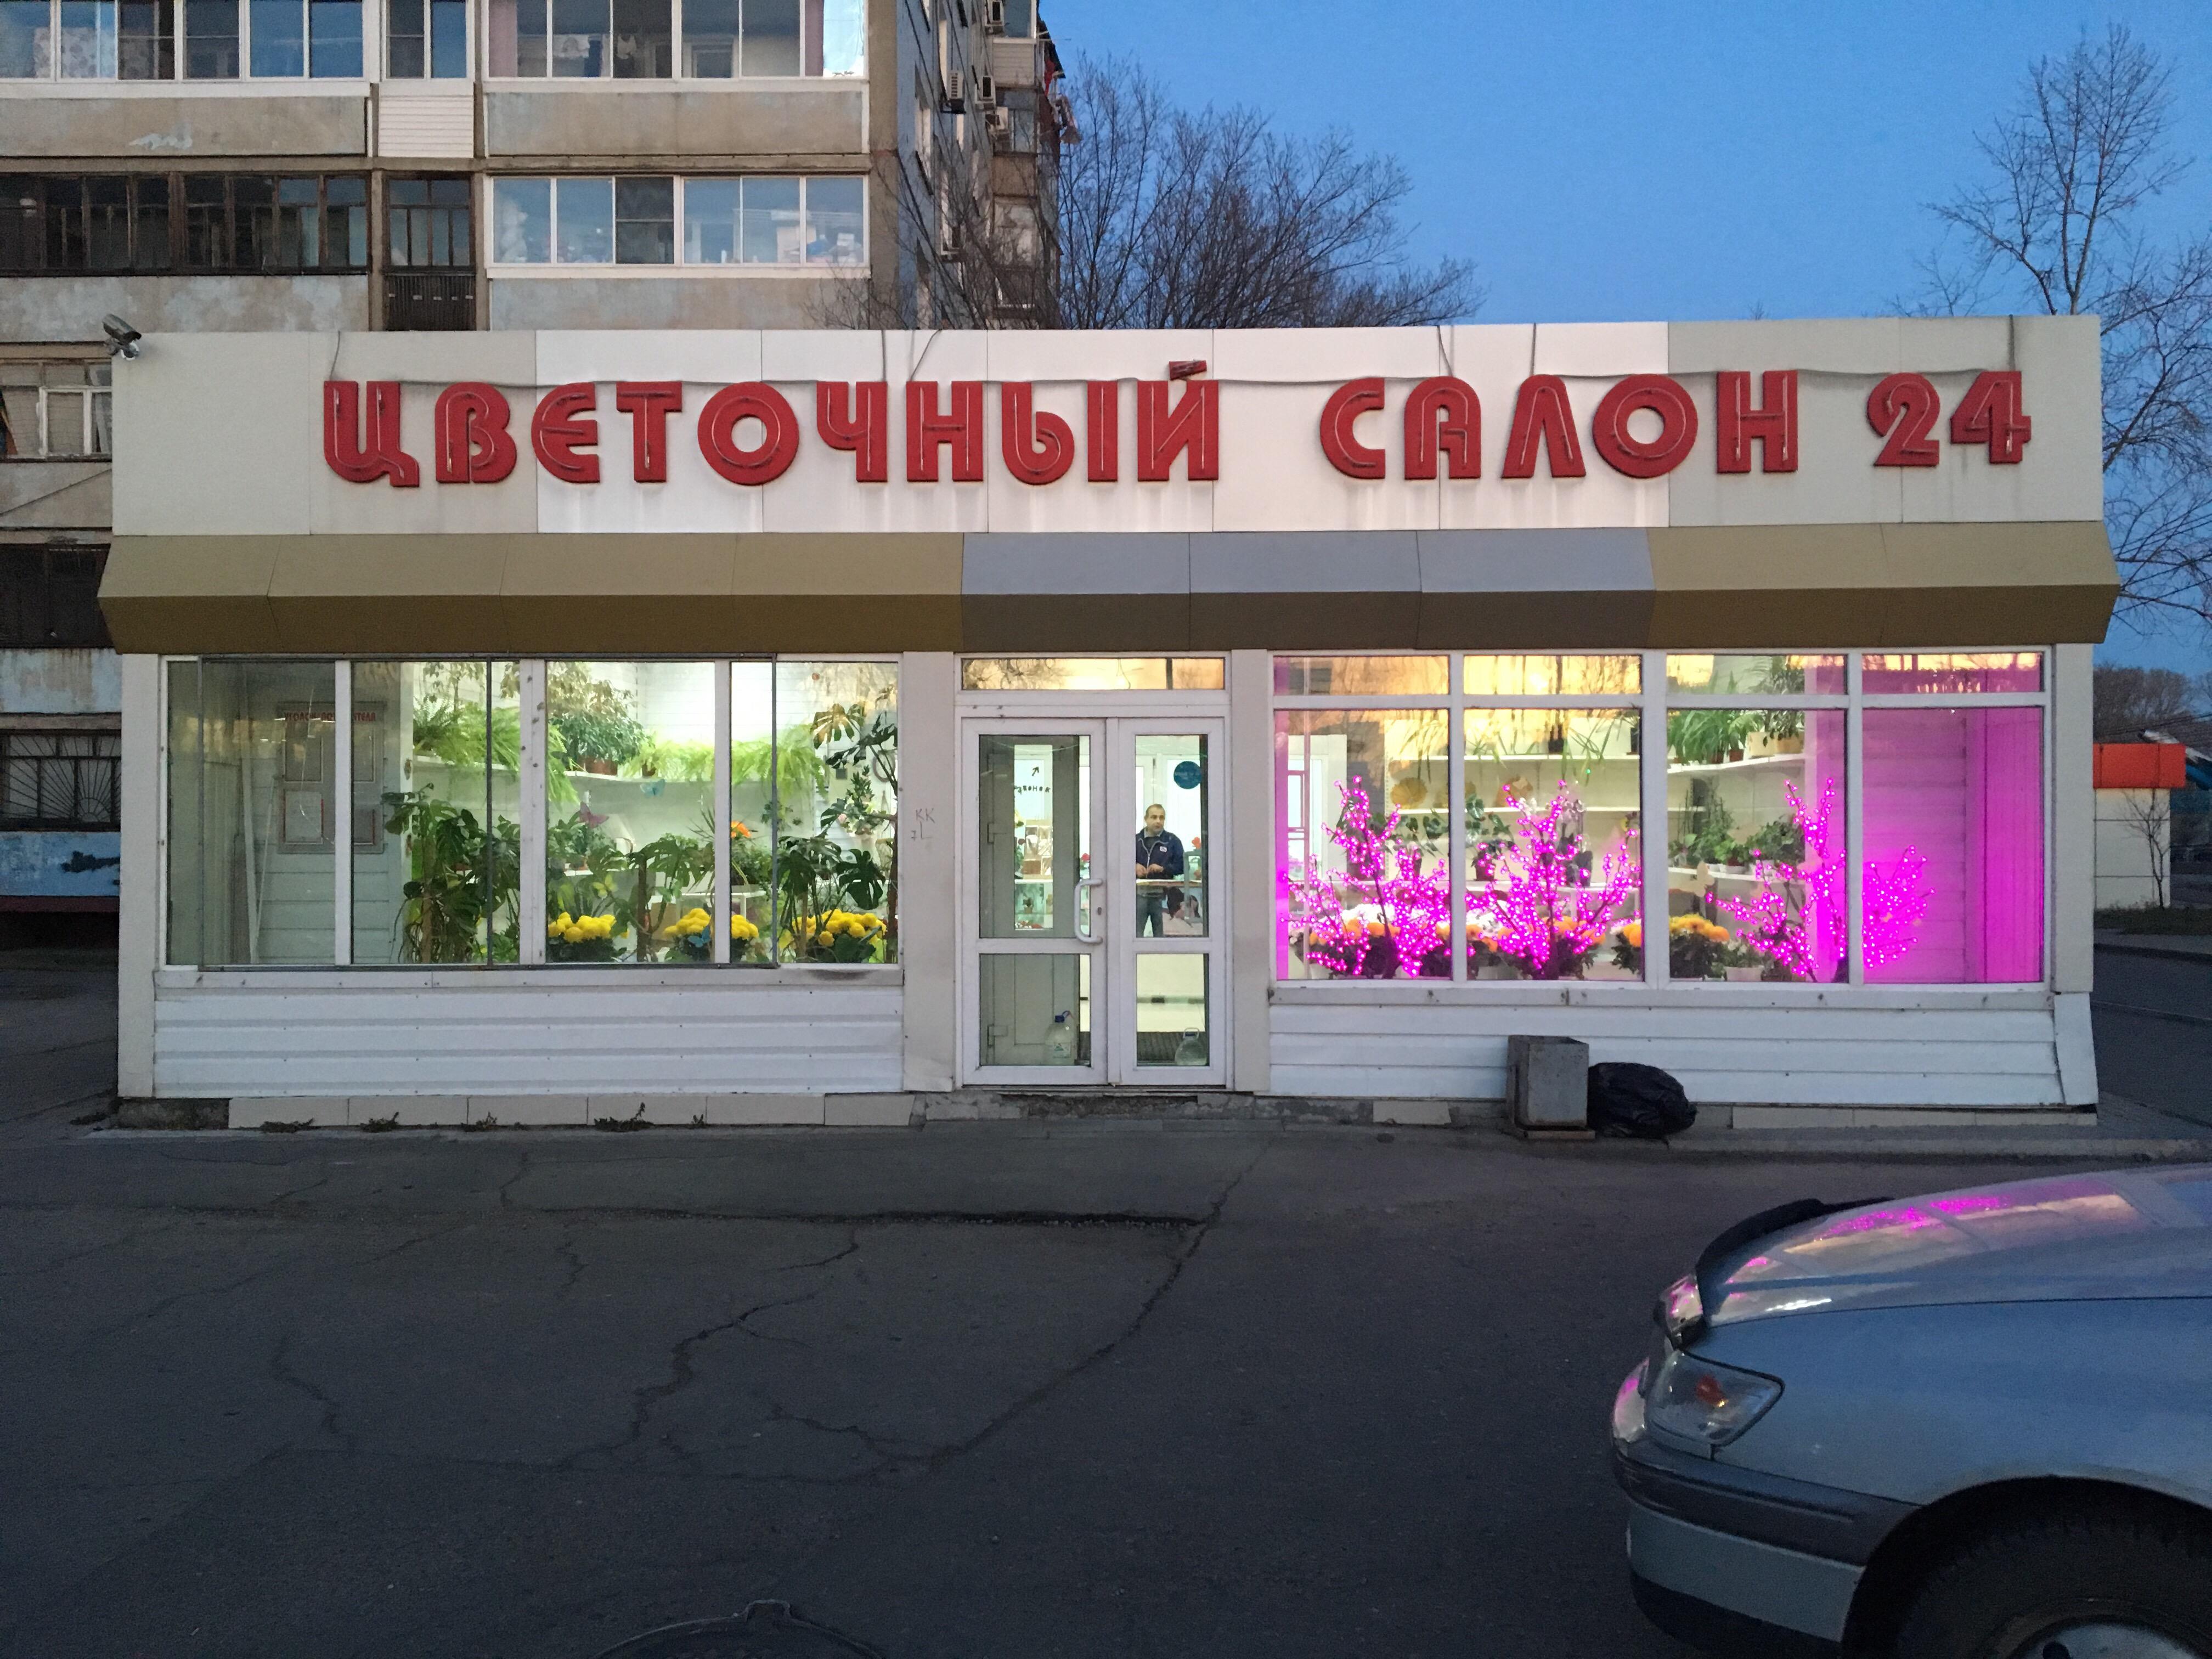 Хабаровск онлайн магазин цветов, магазин цветов